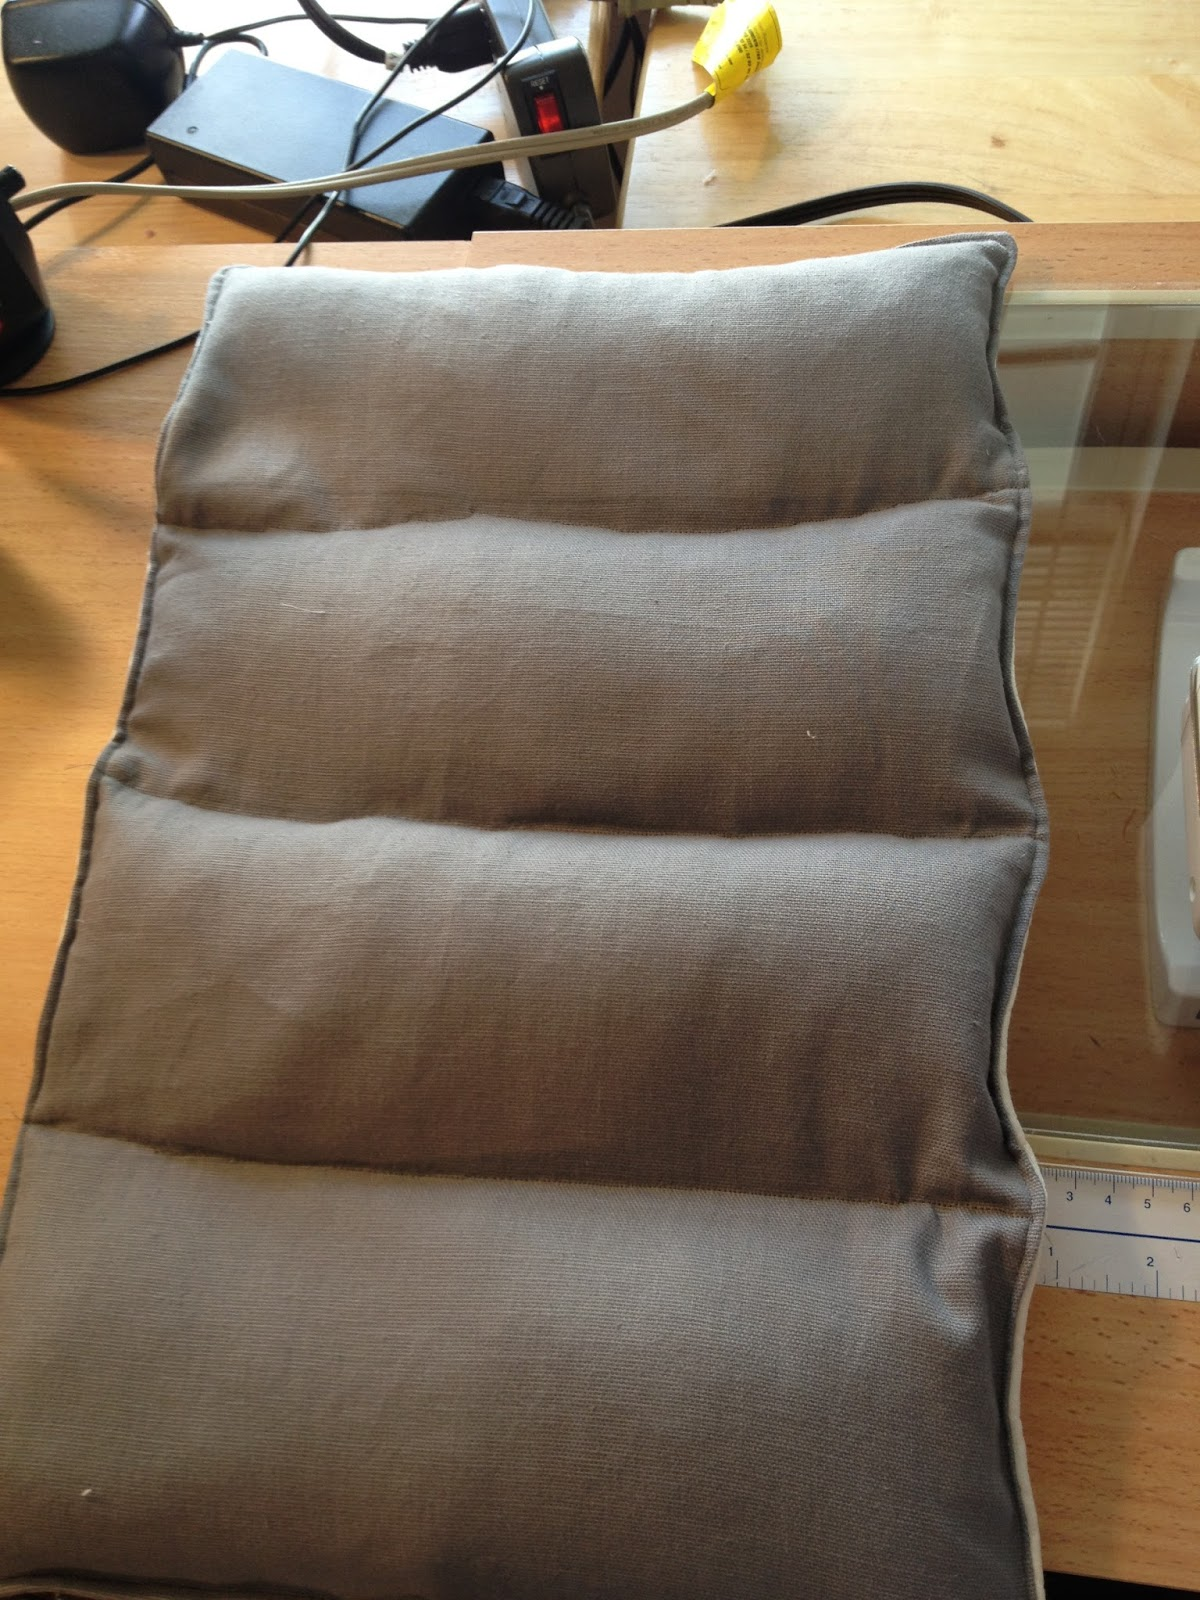 selfish sewing week: rice-filled hot pad tutorial